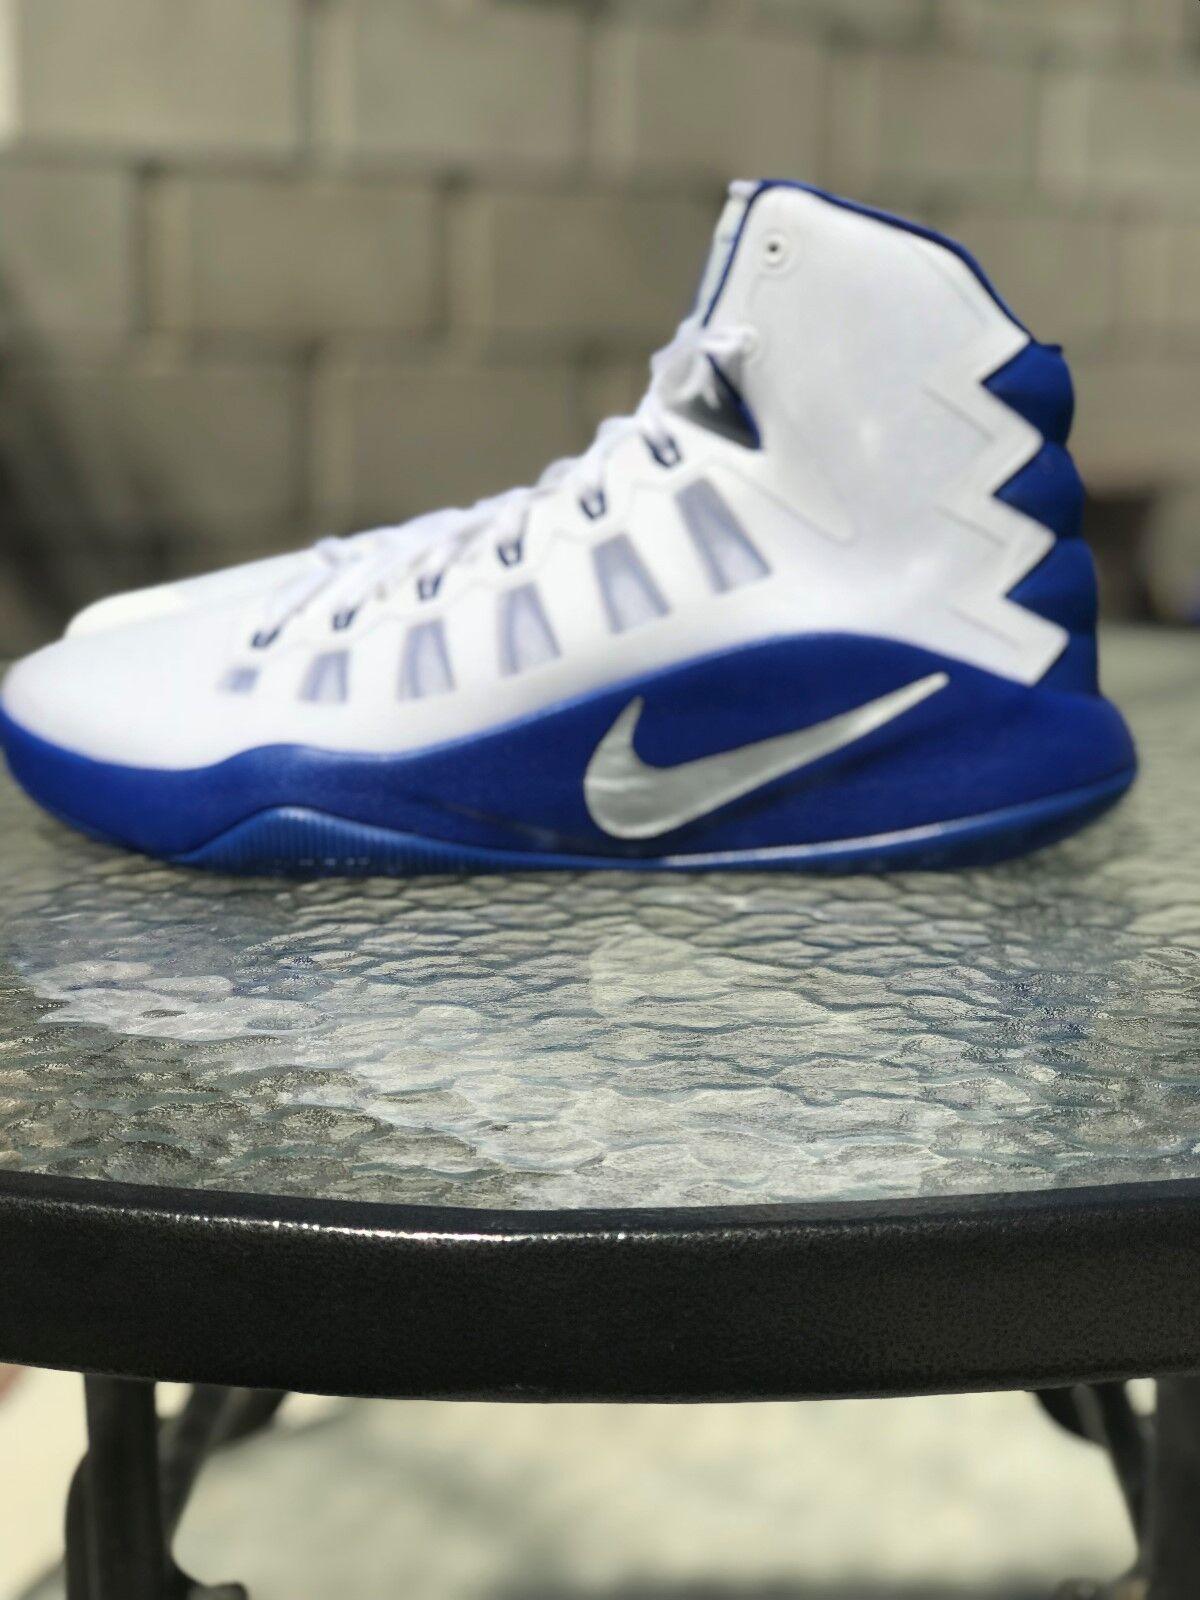 Nike Mens Hyperdunk 2018 Basketball Shoe White and Blue Size 14